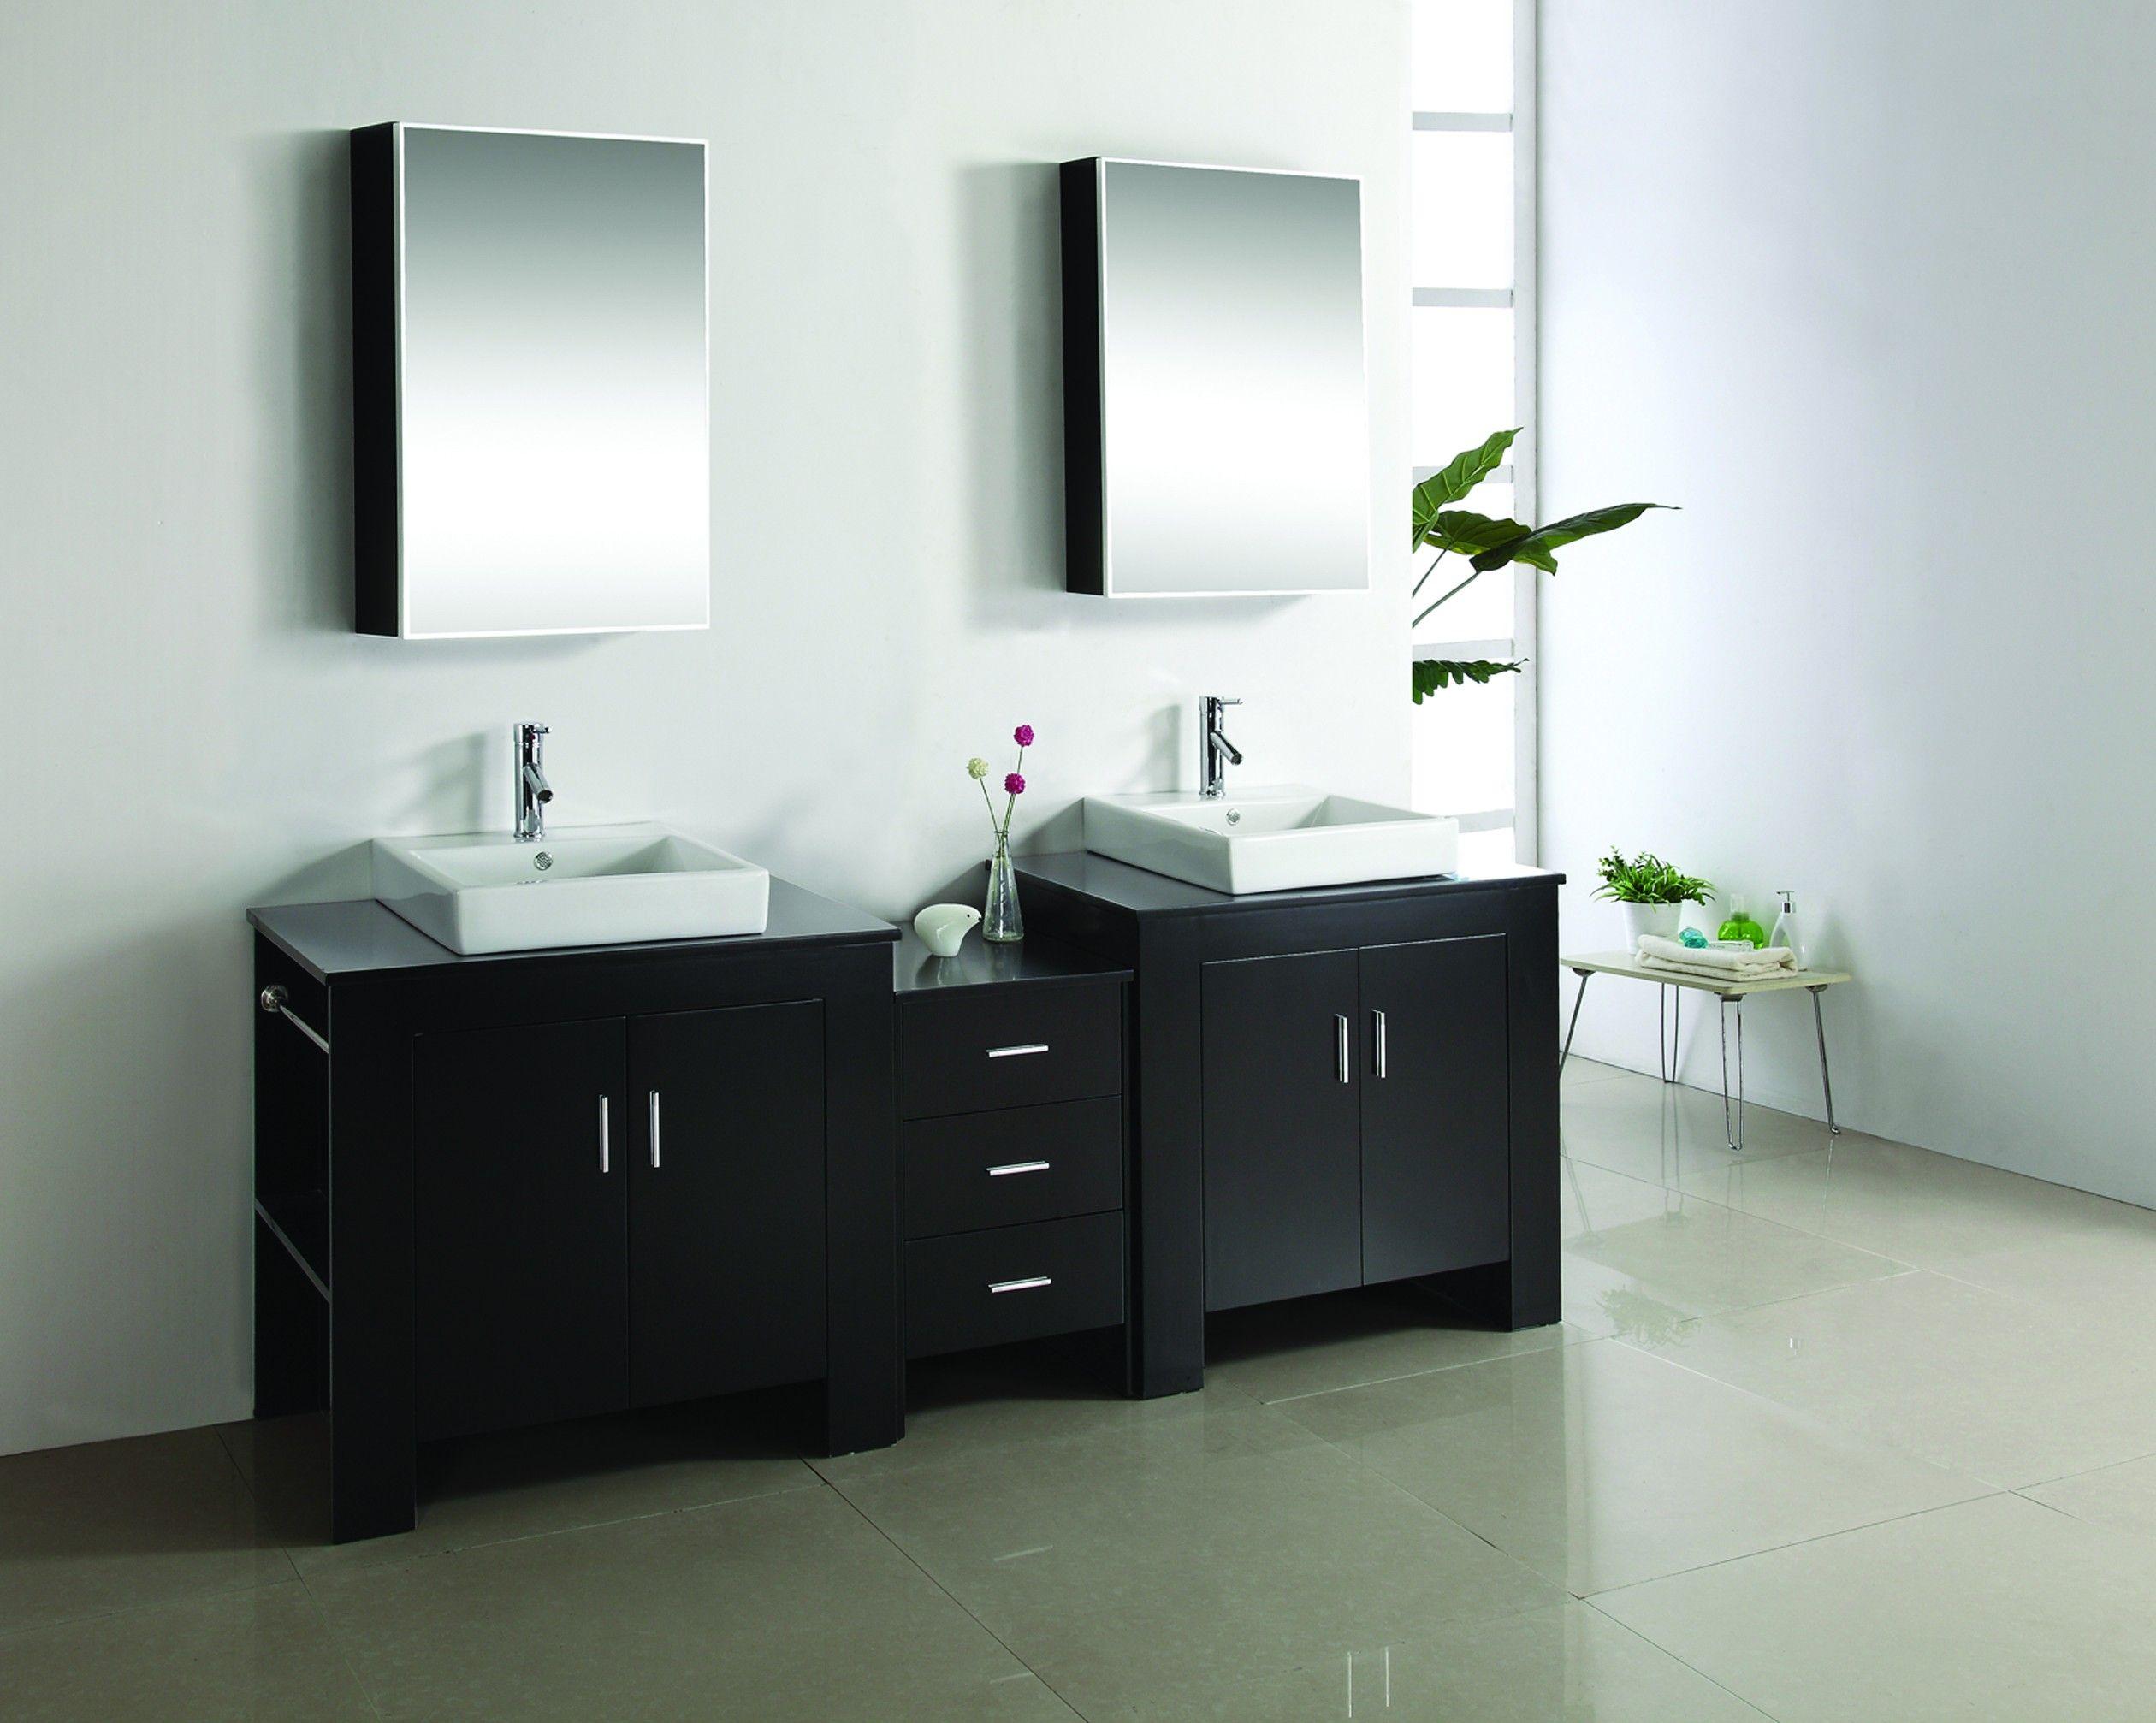 Virtu Usa 90 Tavian Espresso Double Sink Bathroom Vanity Vanity Double Vanity Bathroom Bathroom Vanity [ 2014 x 2520 Pixel ]